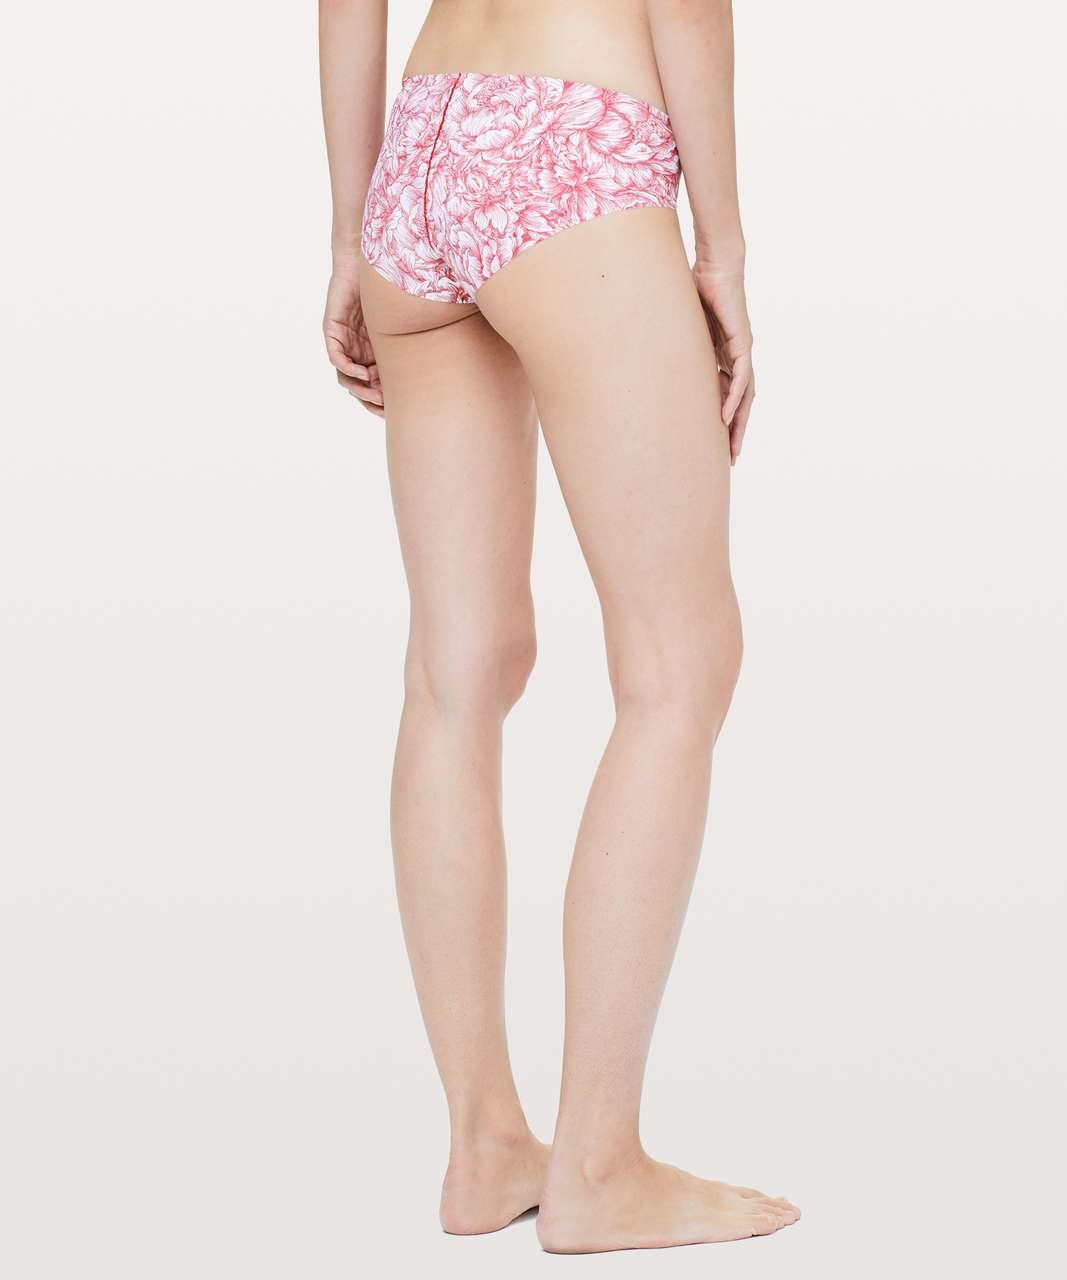 Lululemon Namastay Put Hipster - Floral Bloom White Star Ruby